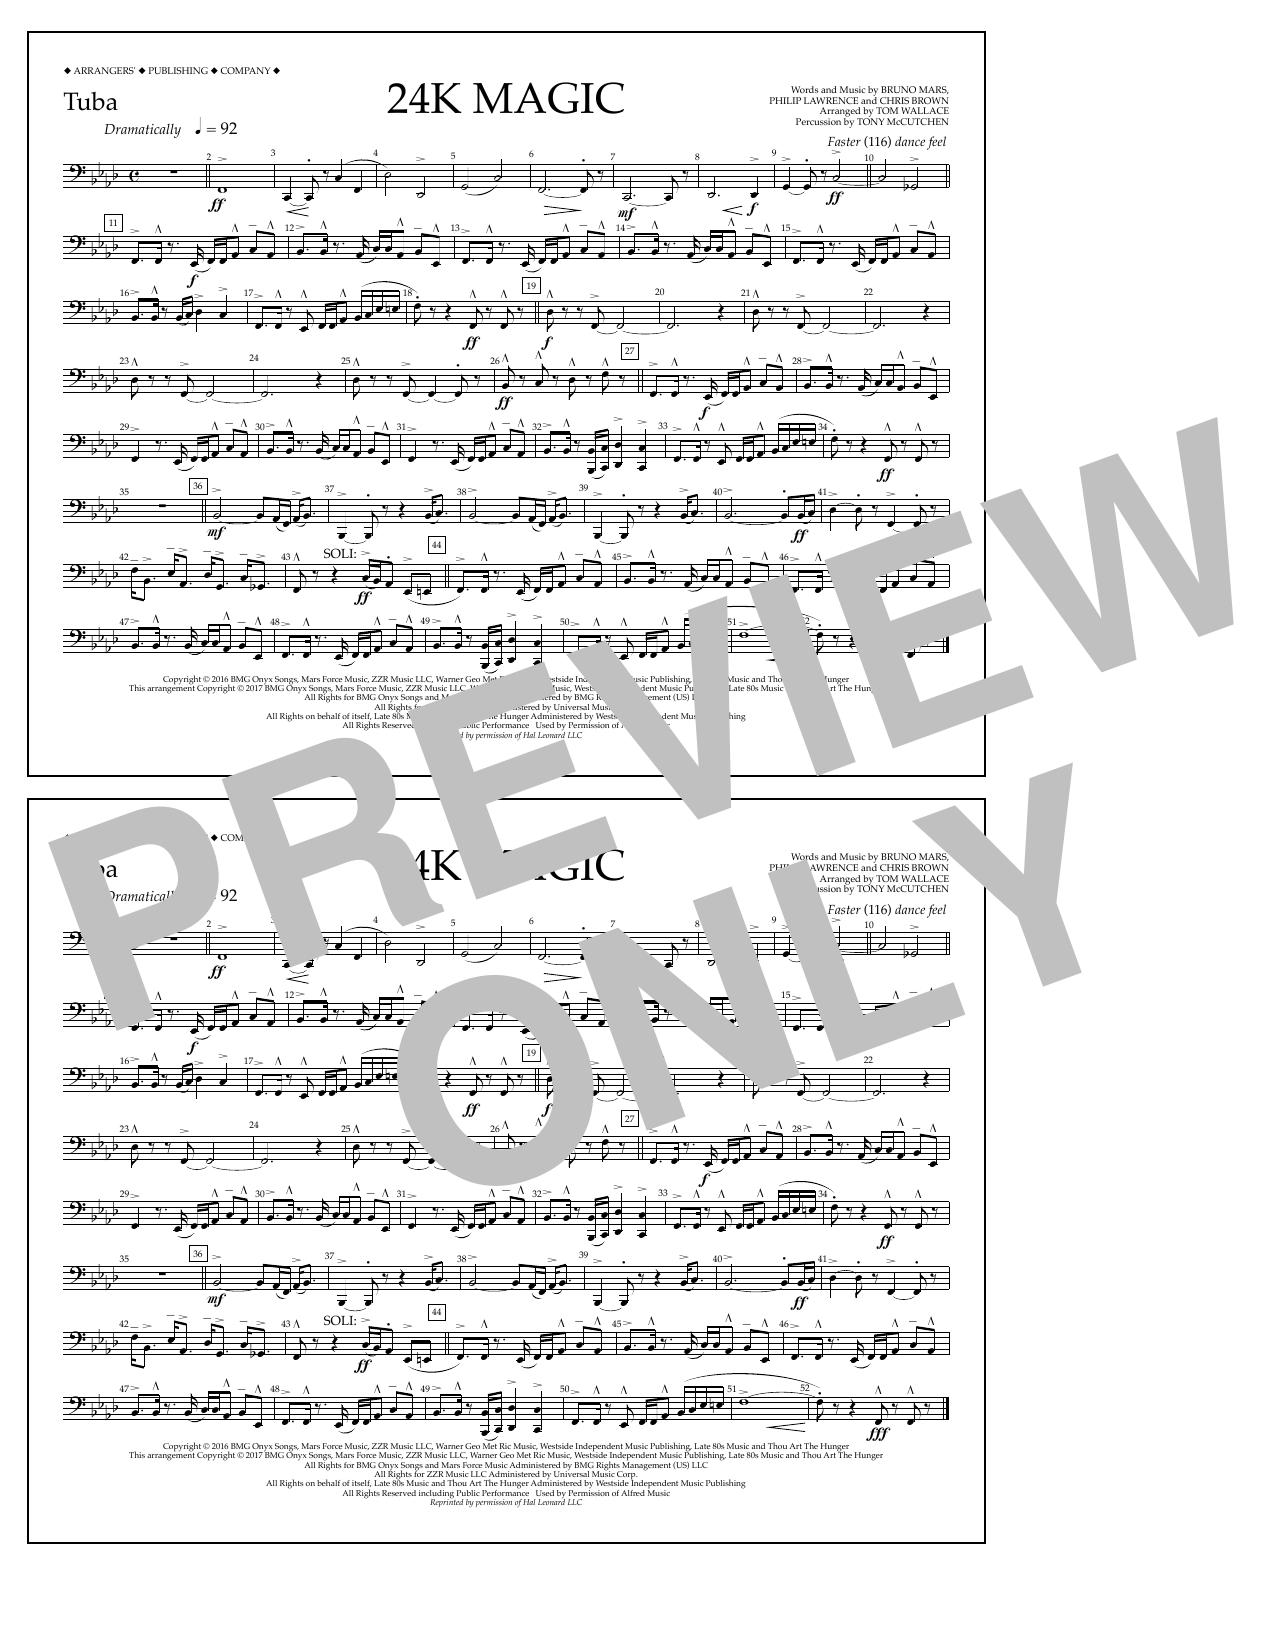 24K Magic - Tuba Sheet Music